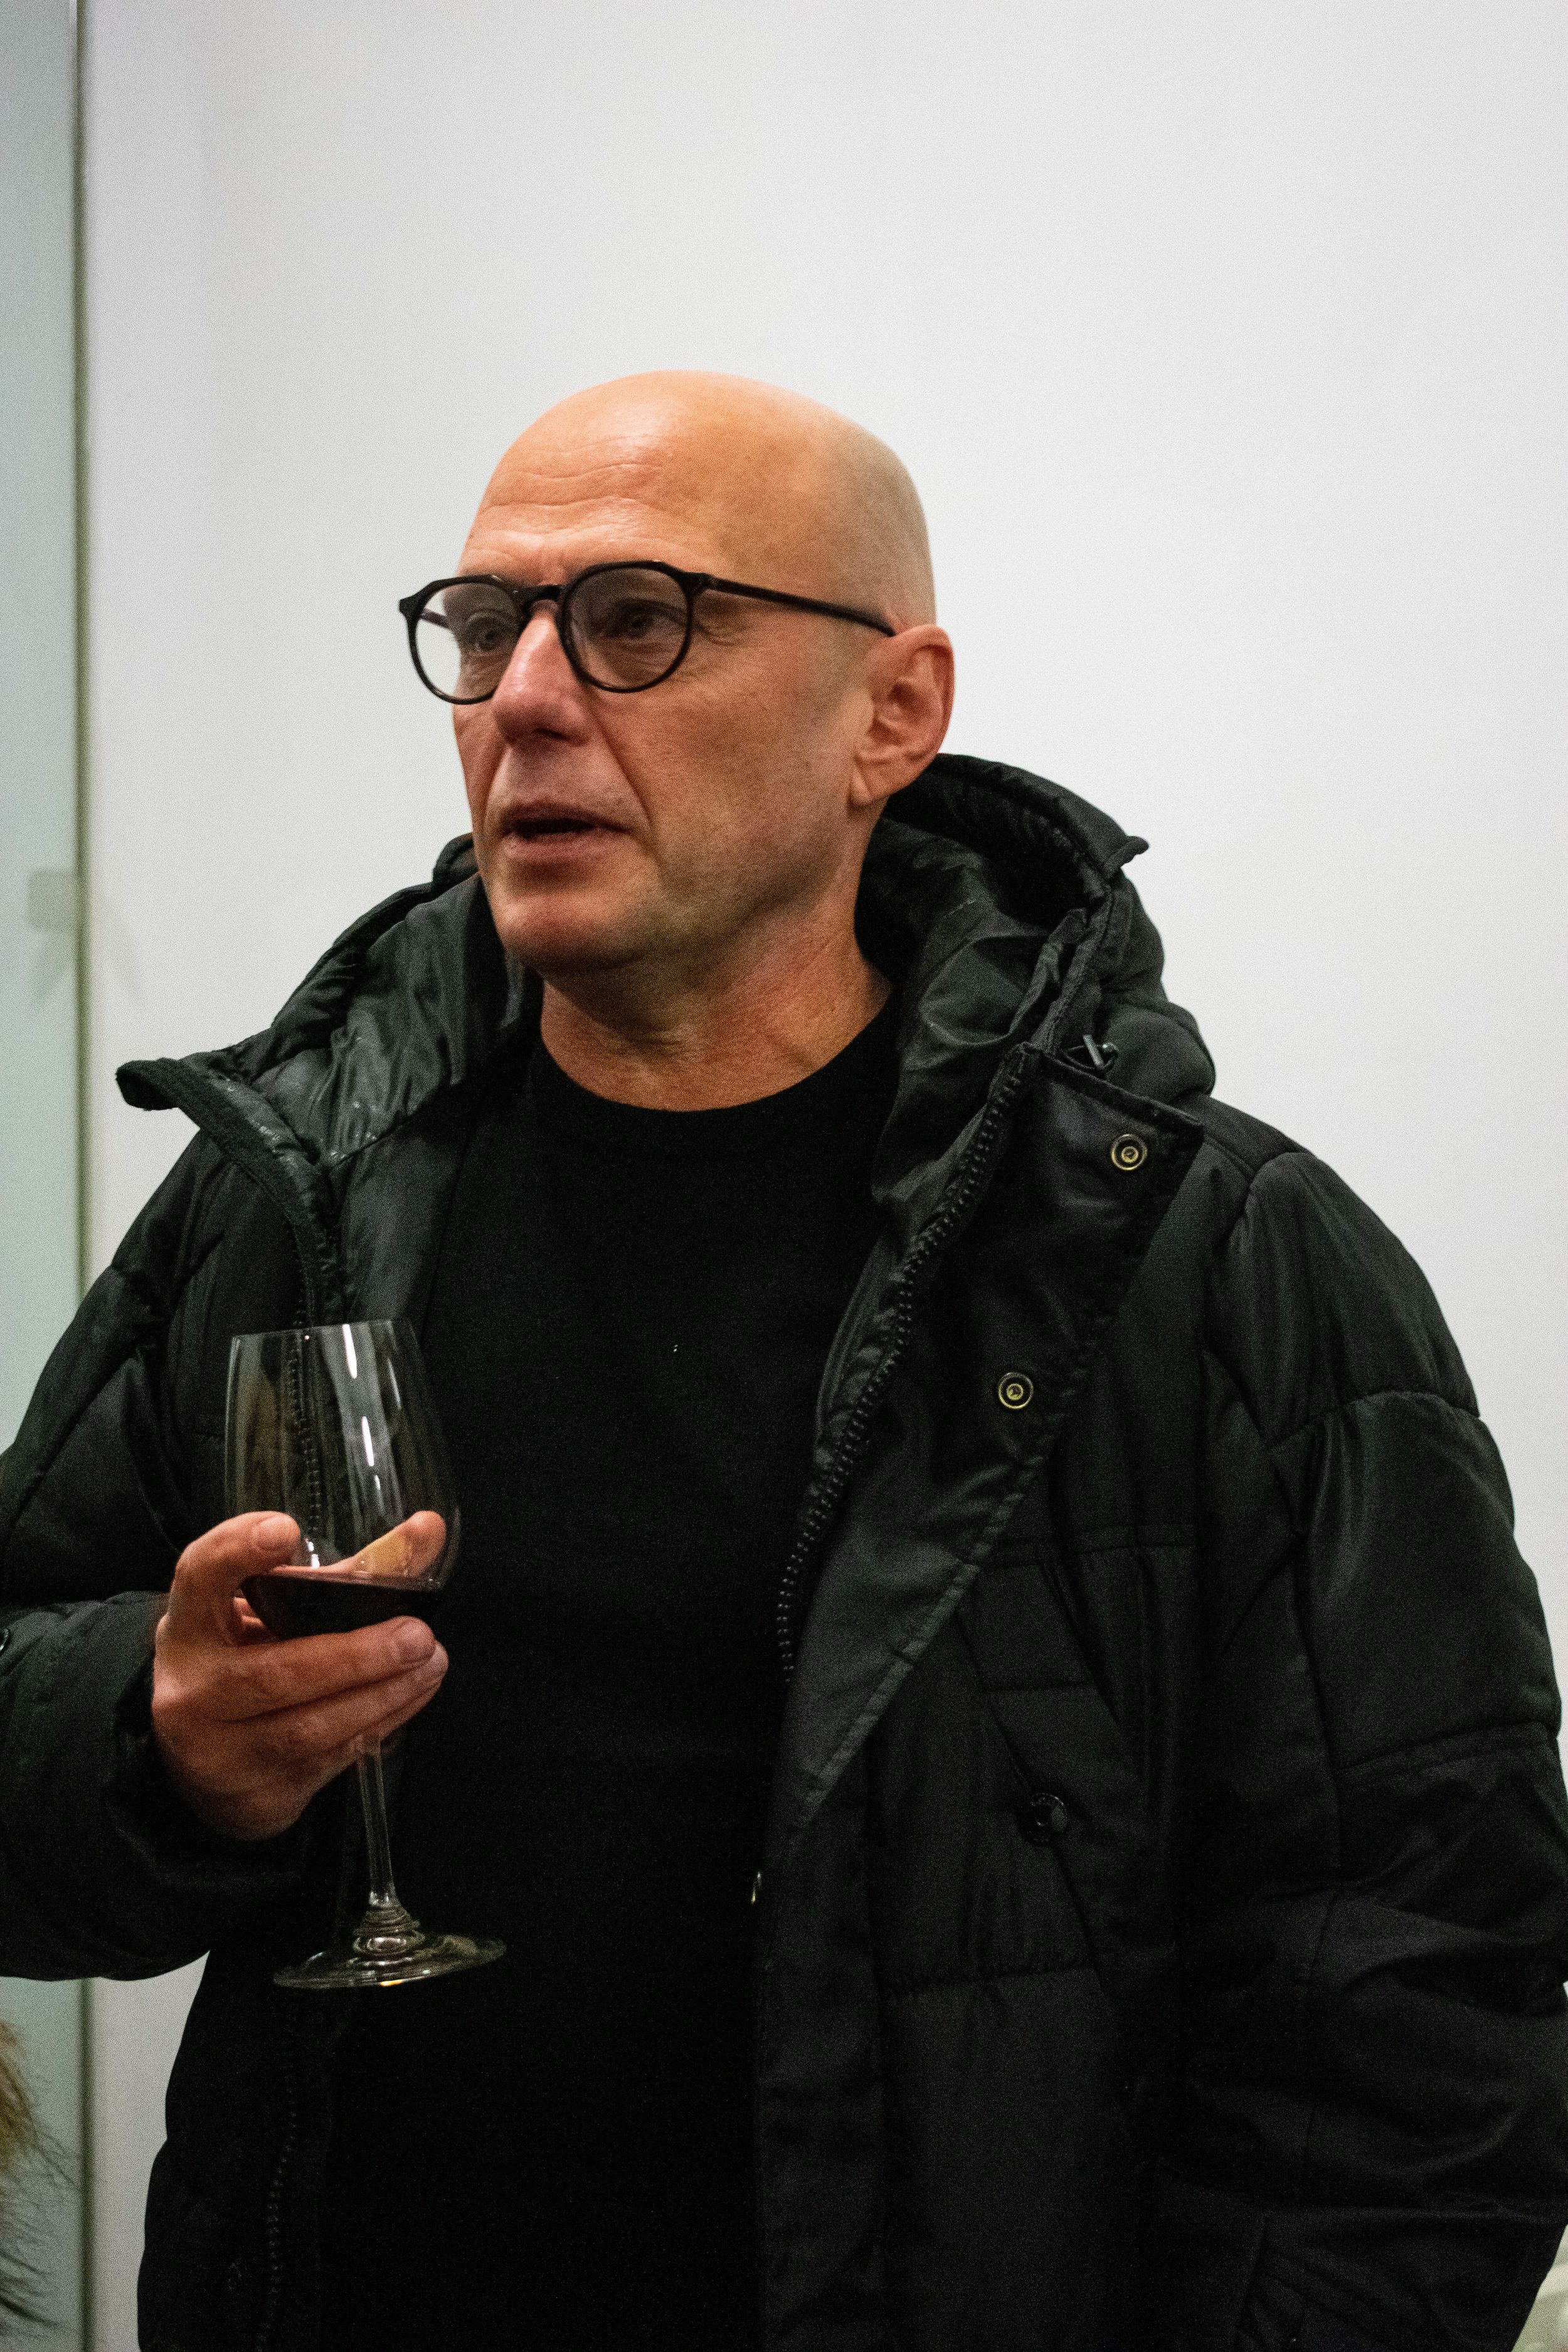 Actor Tzvet Lazar. Photo by Zula Ra